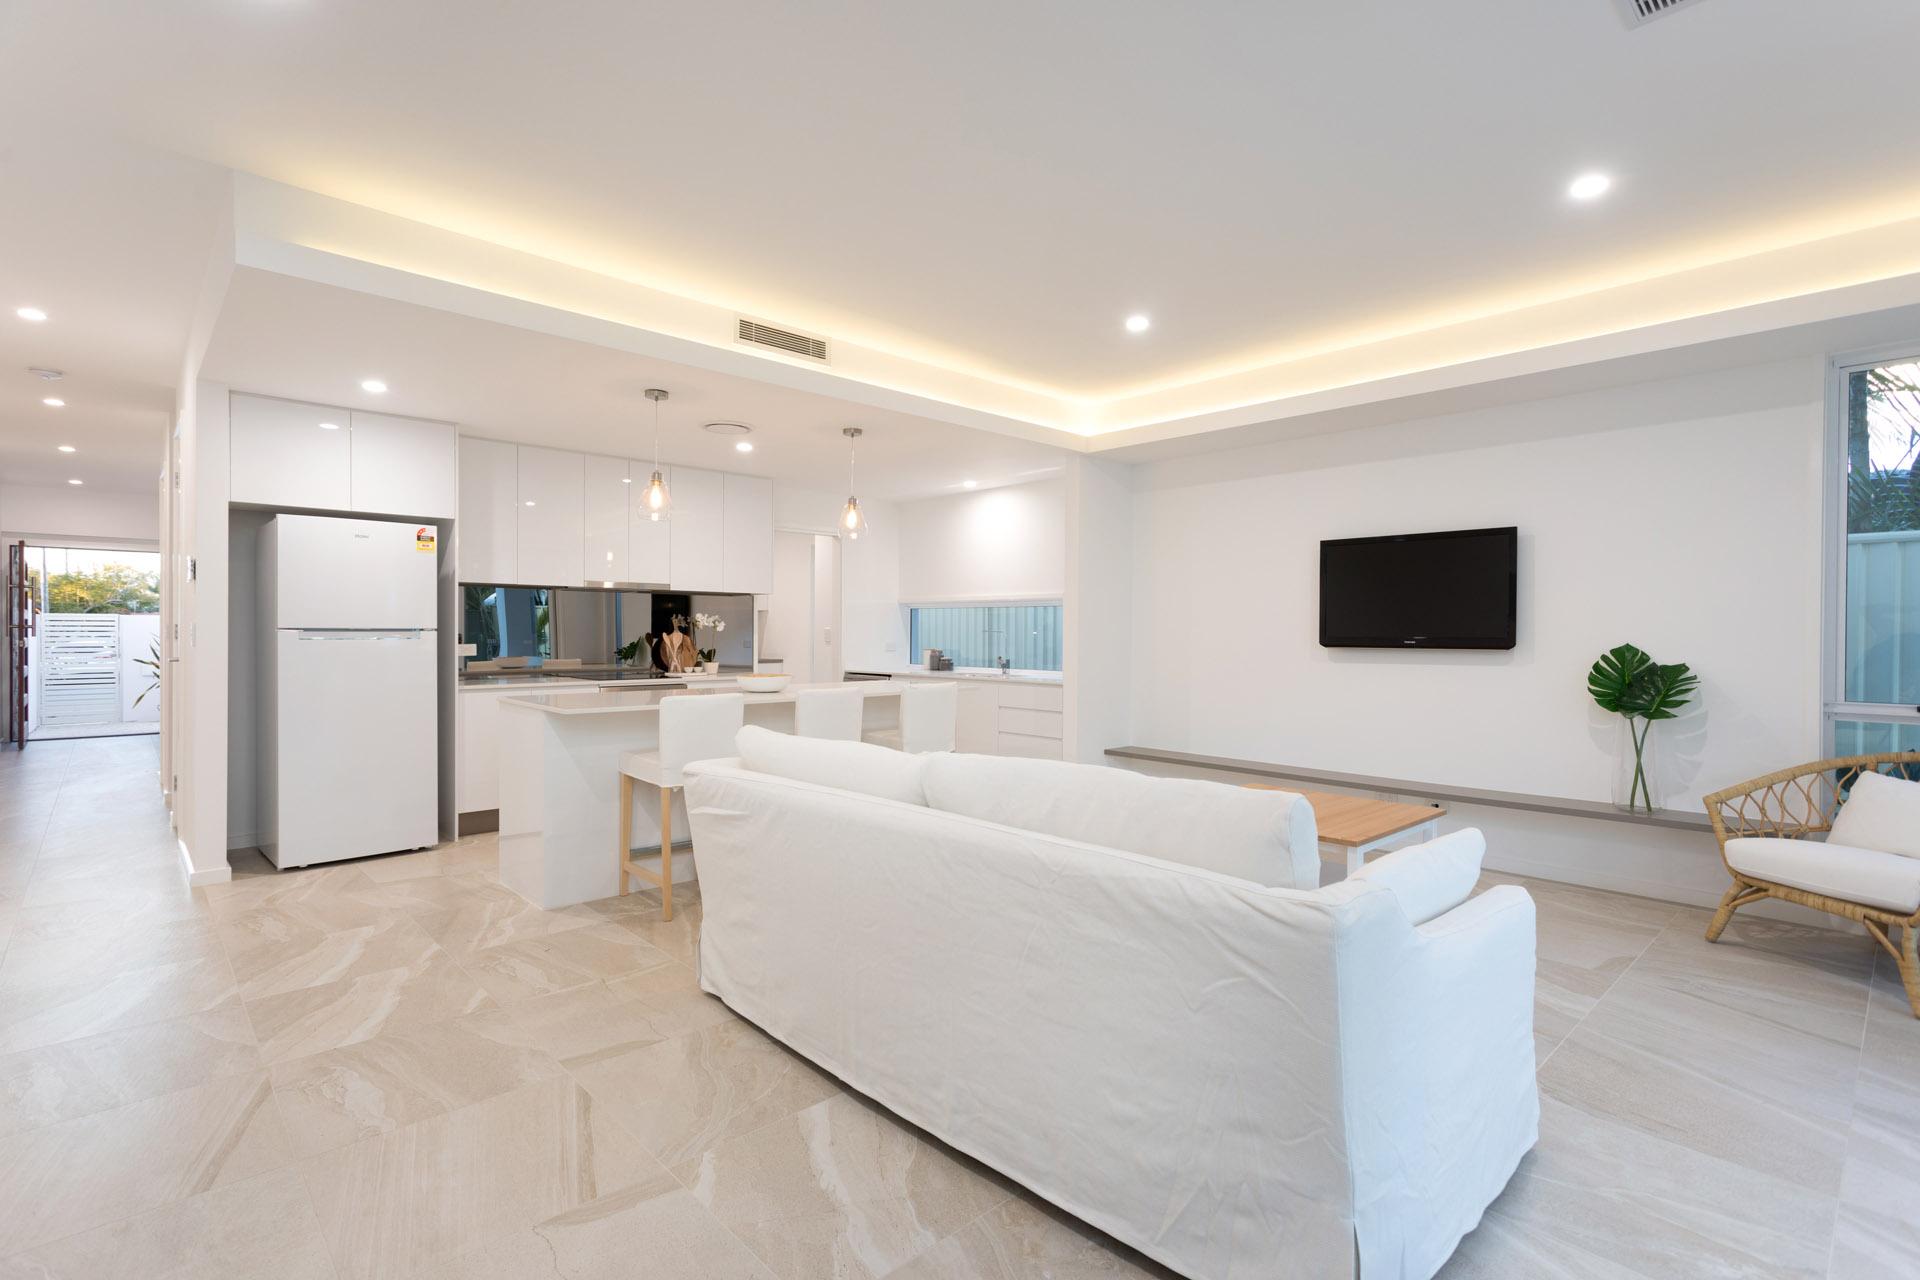 Real Estate | Gold Coast | Chevron Realty | 20180822 0b4a7030